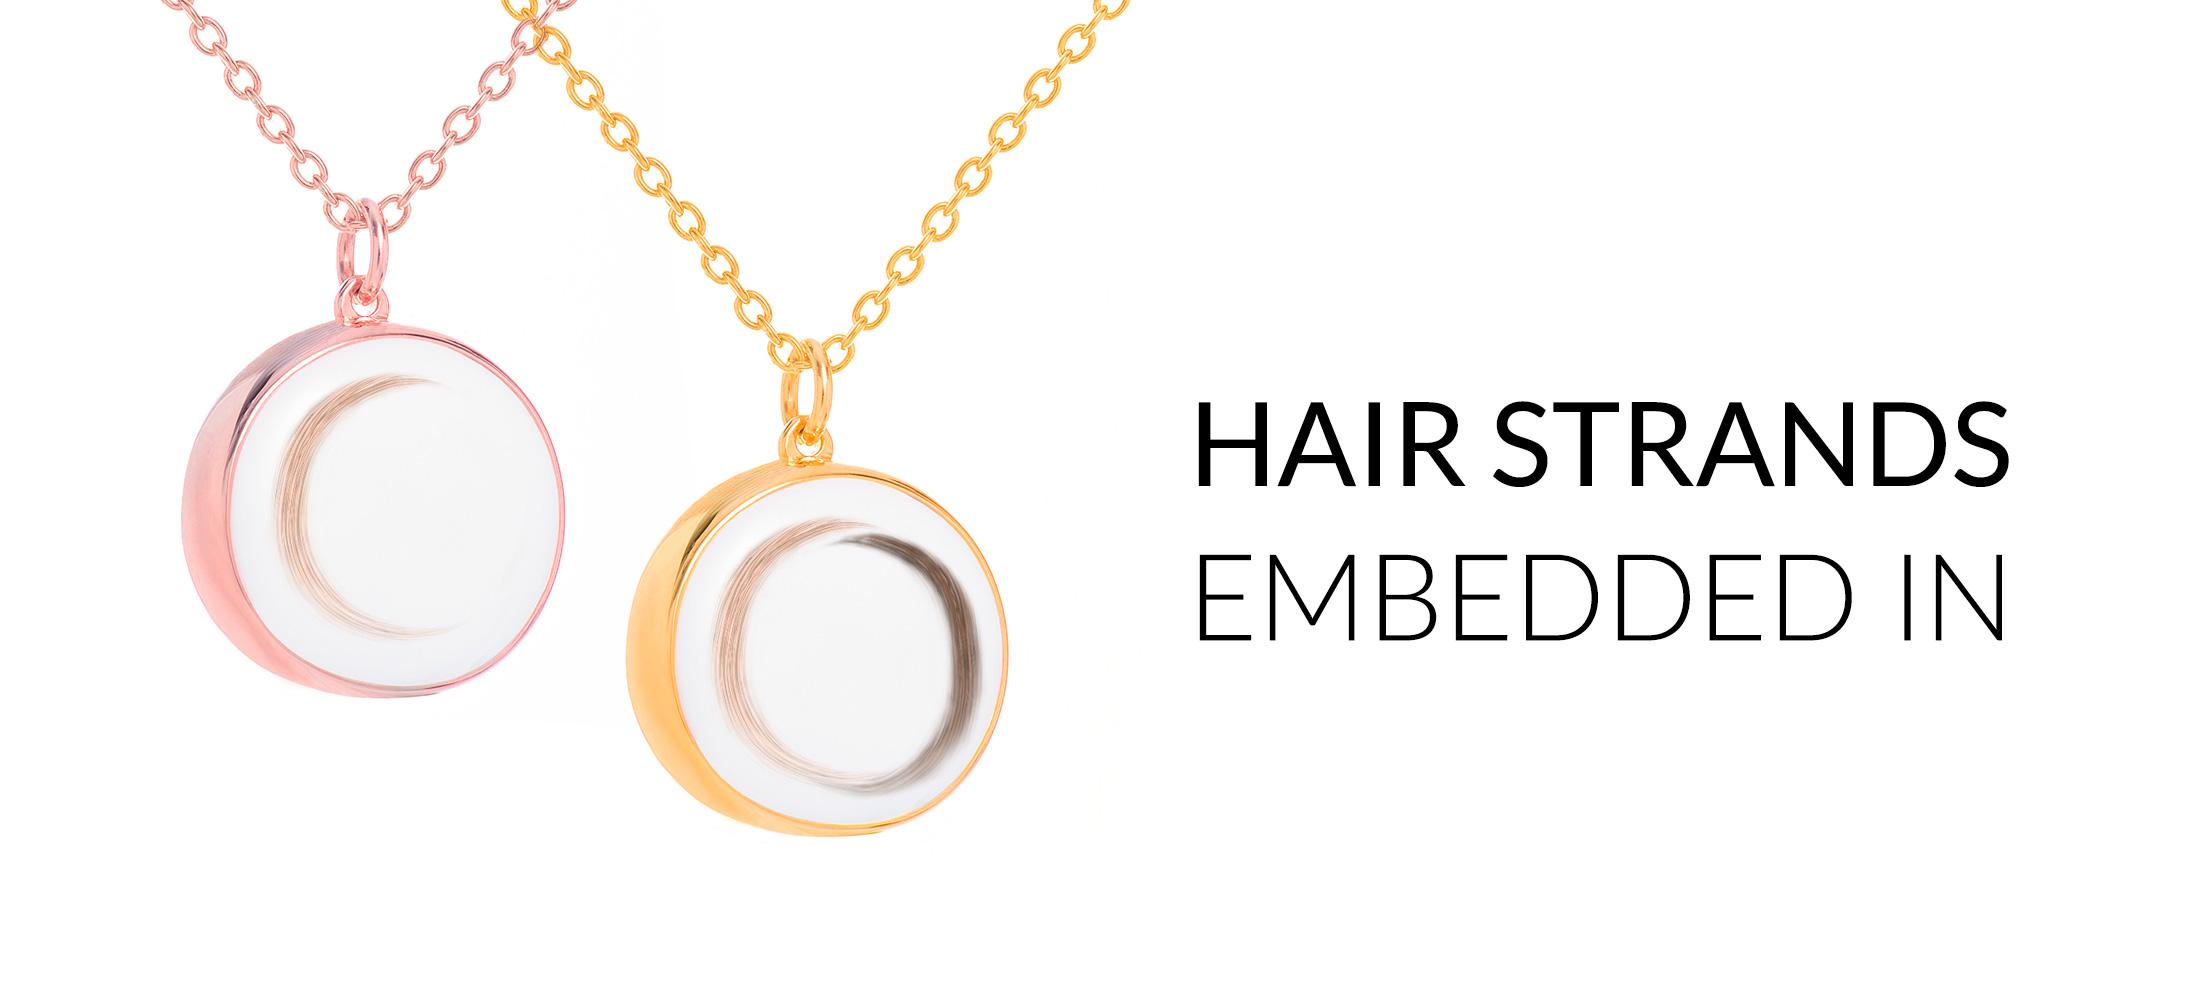 Hair strands embedded in *